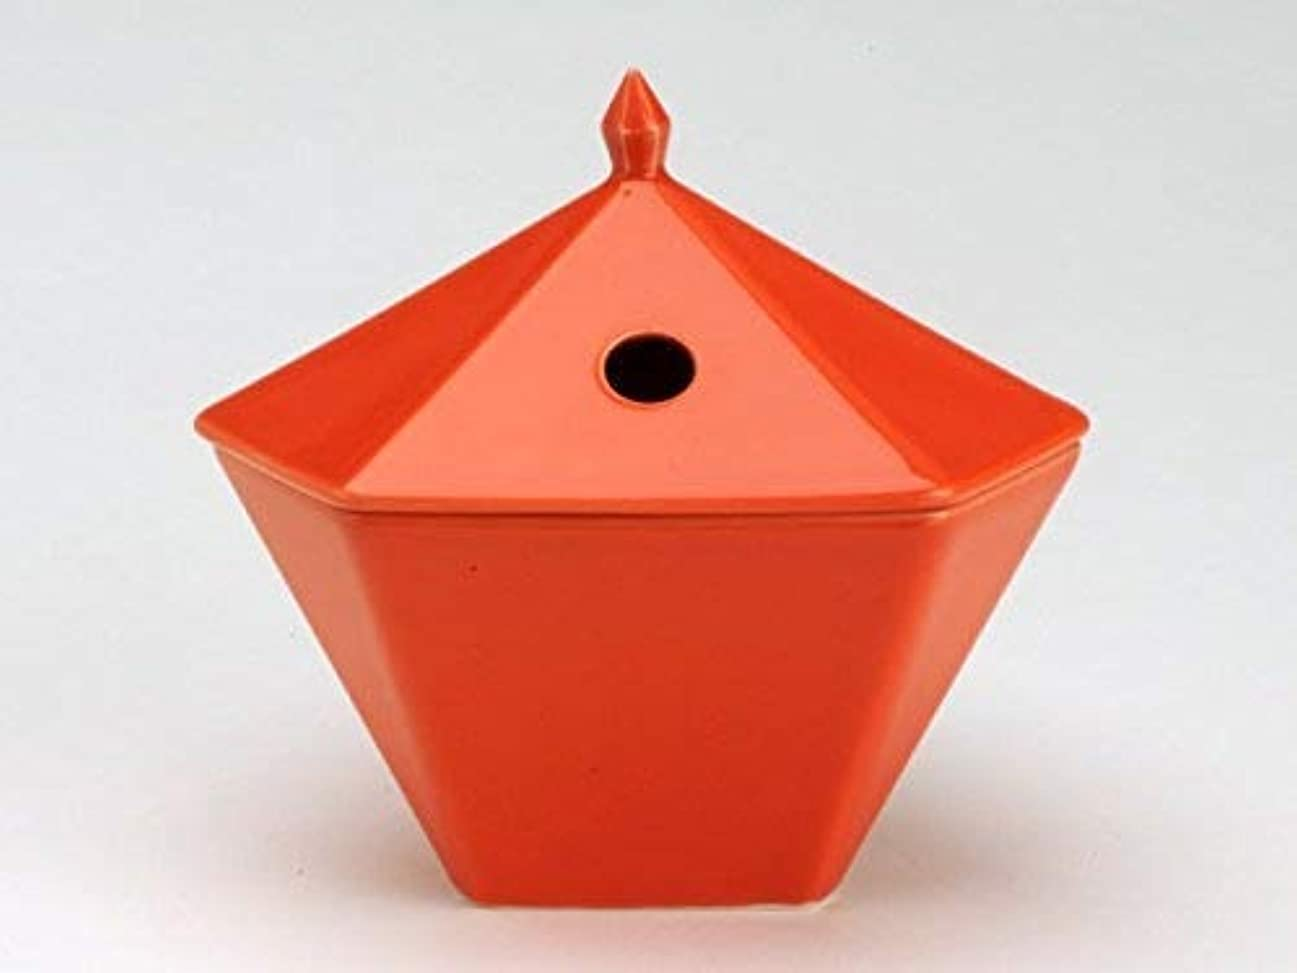 粘土負担保存する縁香炉 橙